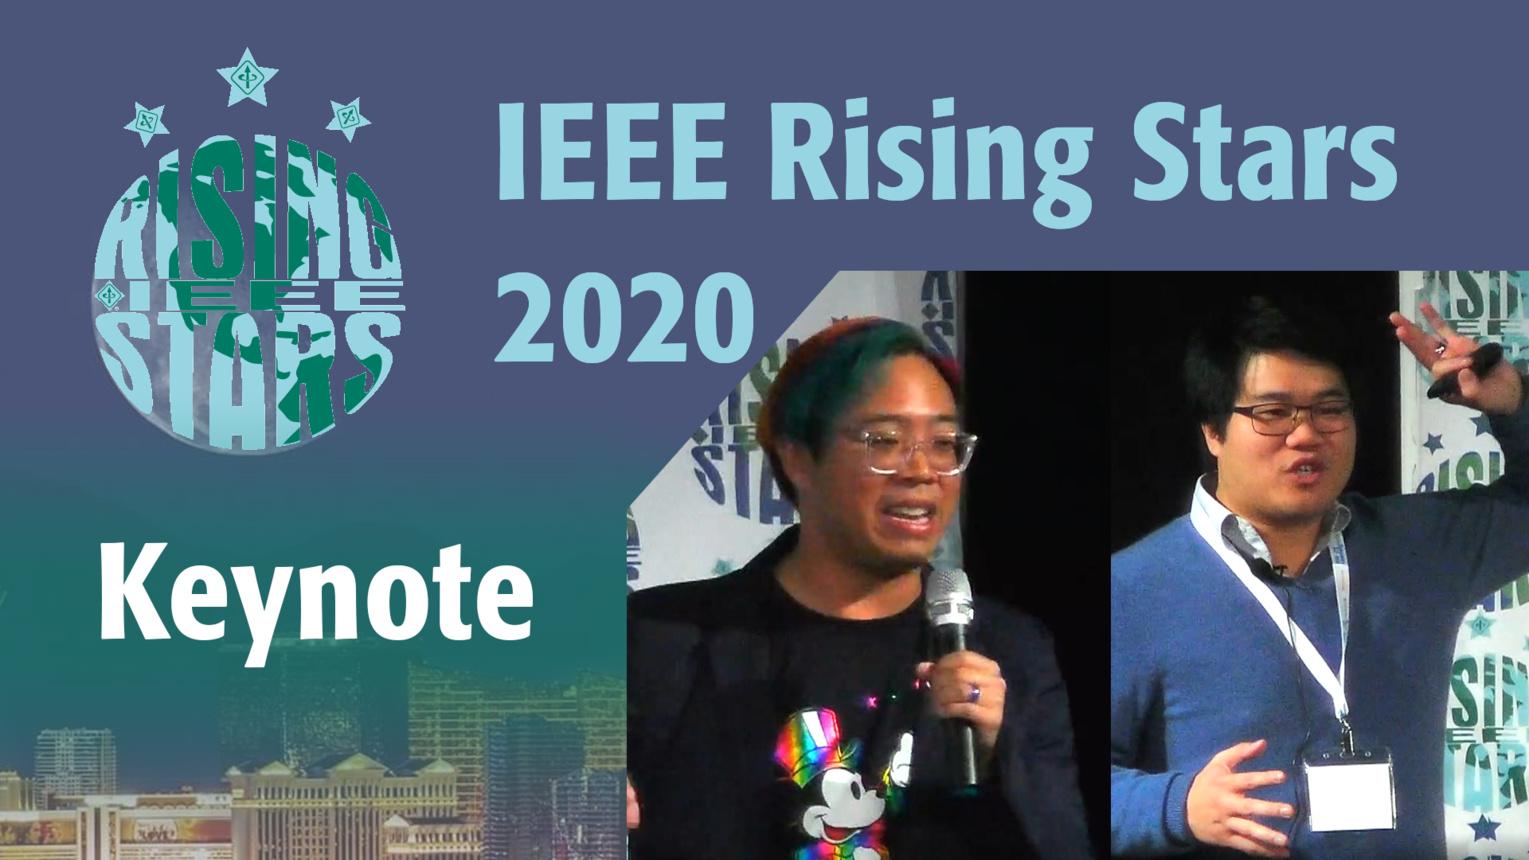 Jonathan Chew & Leo Szeto Keynote -  IEEE Rising Stars 2020